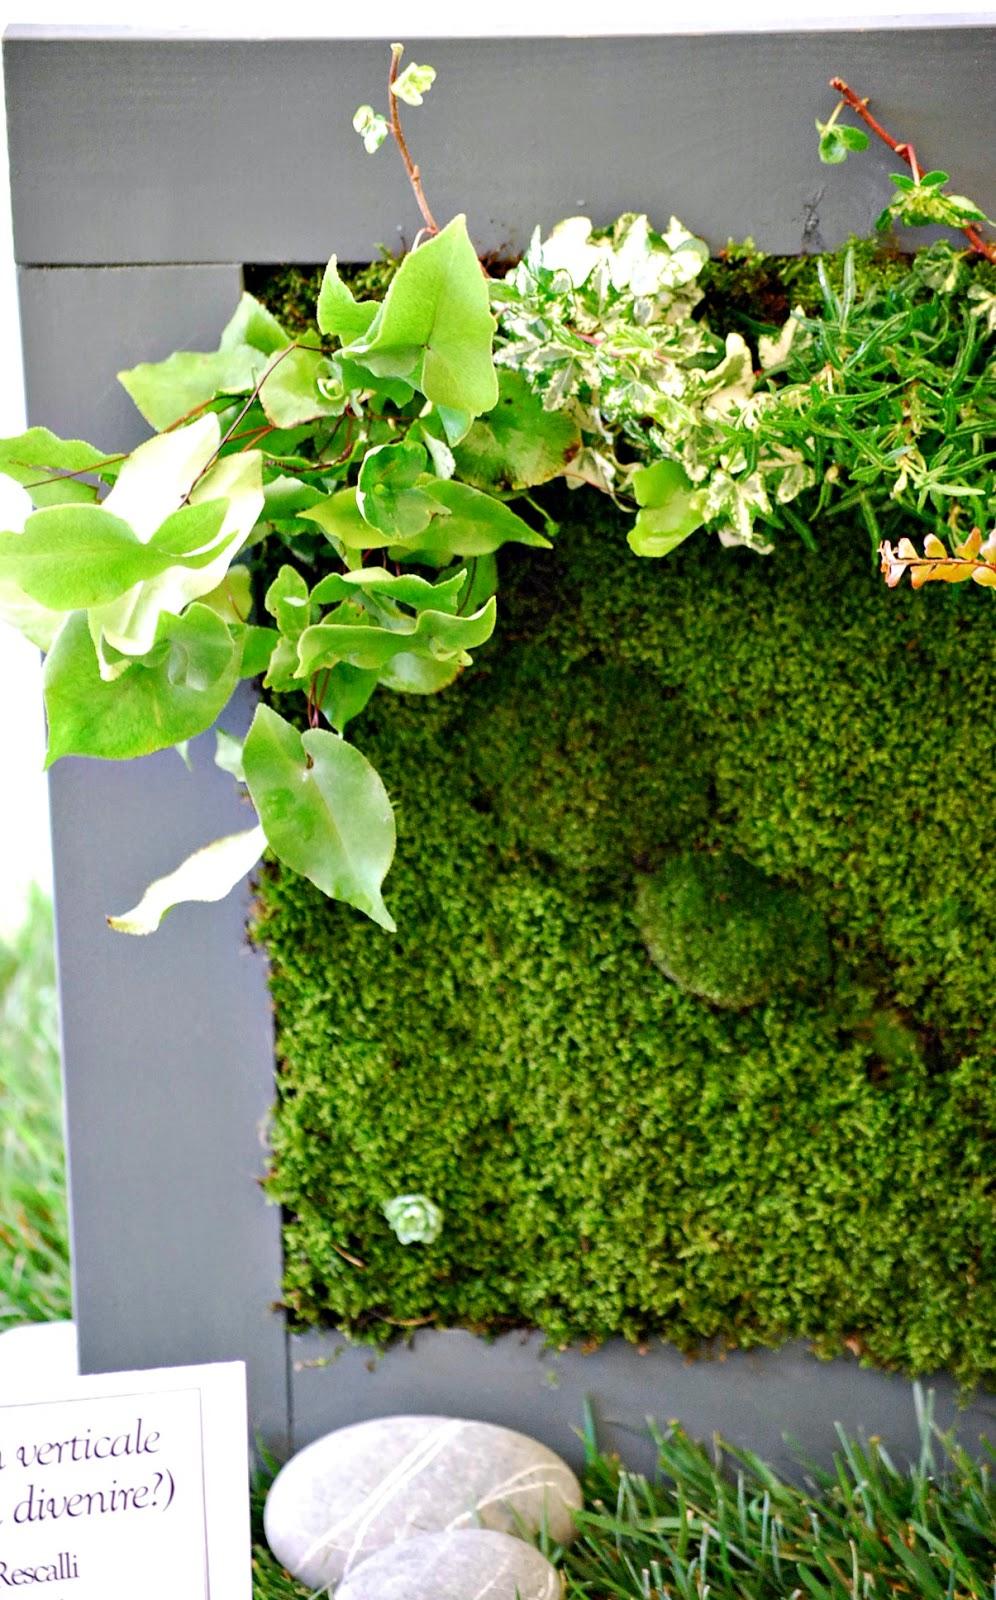 Fior d co giardino in miniatura - Giardino in miniatura ...